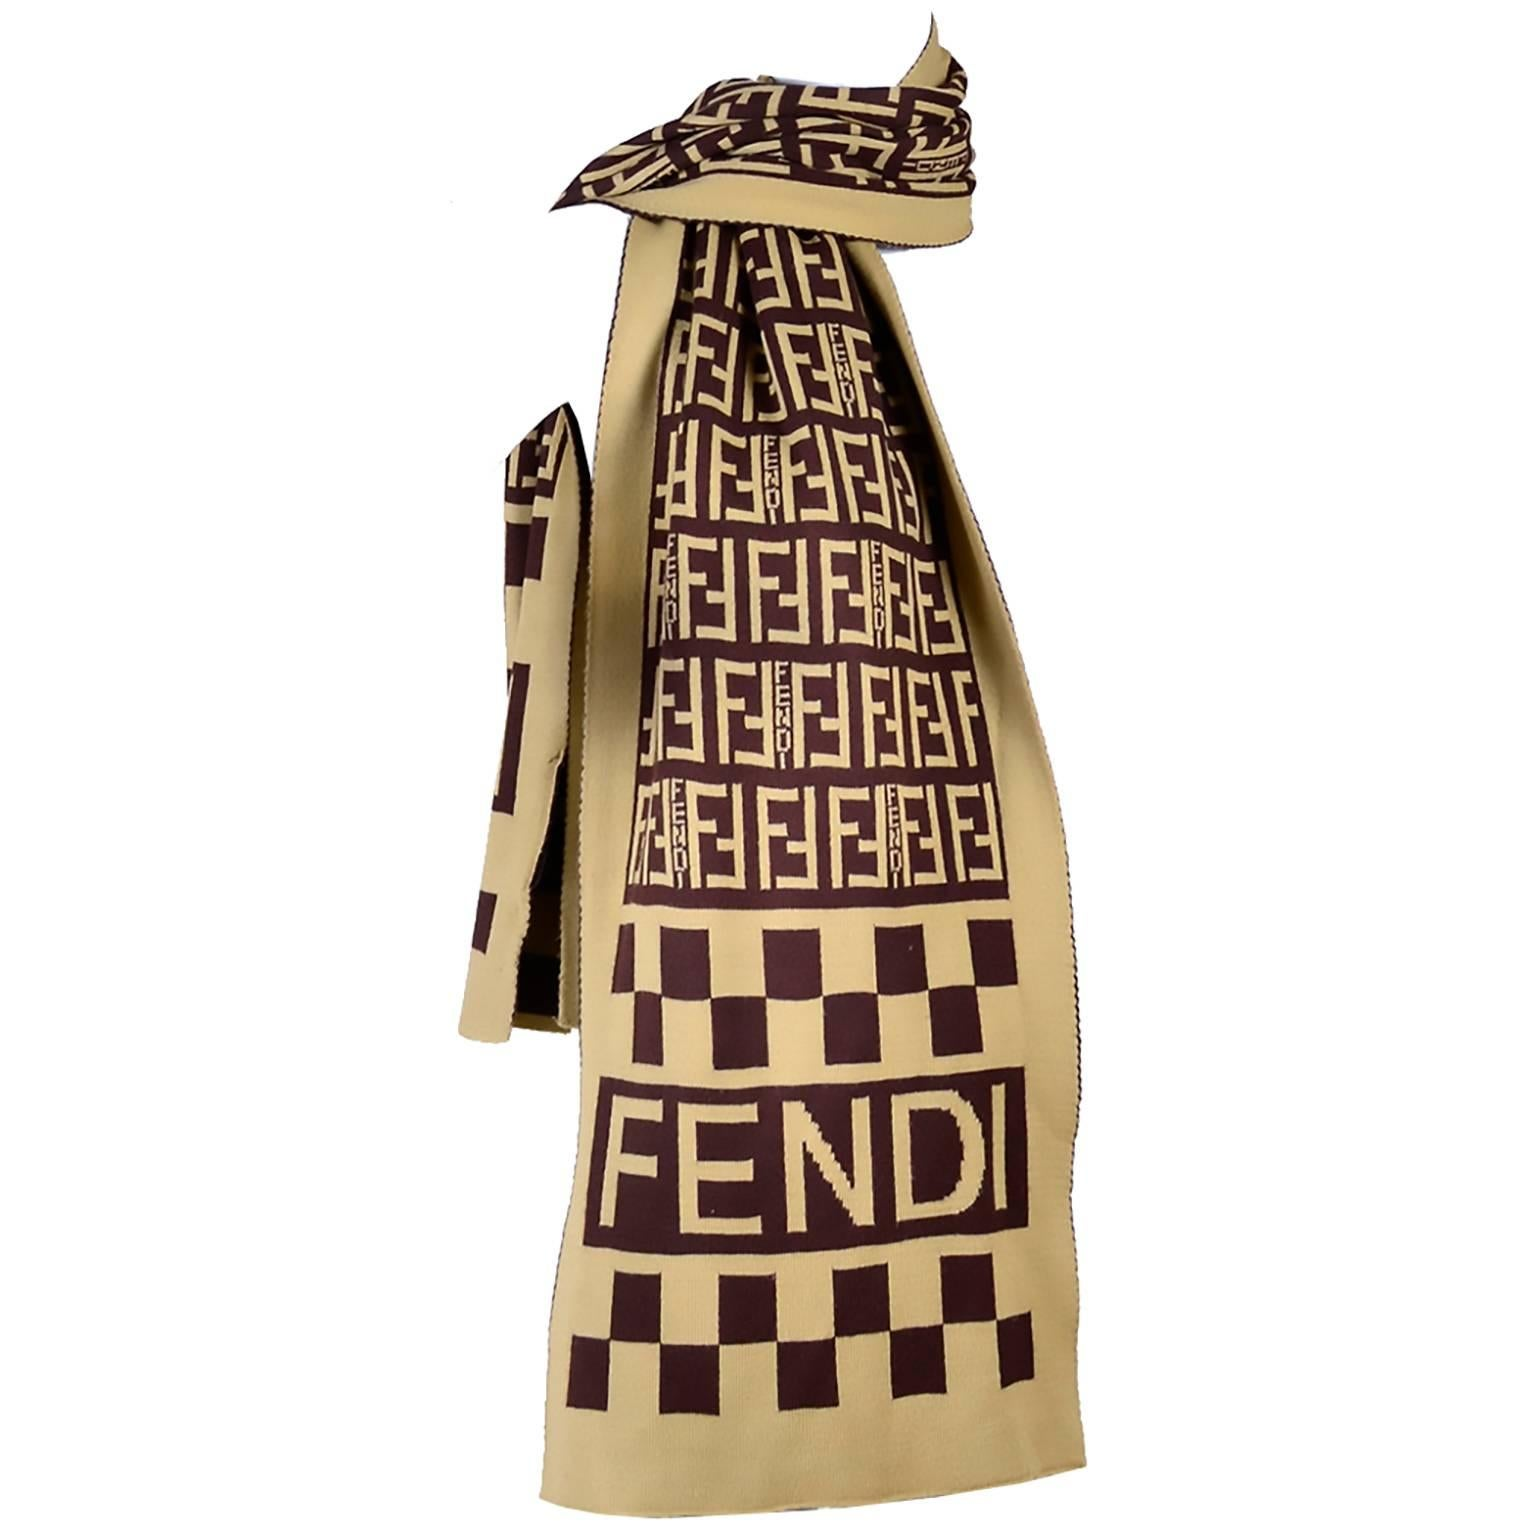 c2d7b079c000 Fendi Vintage Zucca Monogram Cashmere Wool Logo Scarf Muffler at 1stdibs